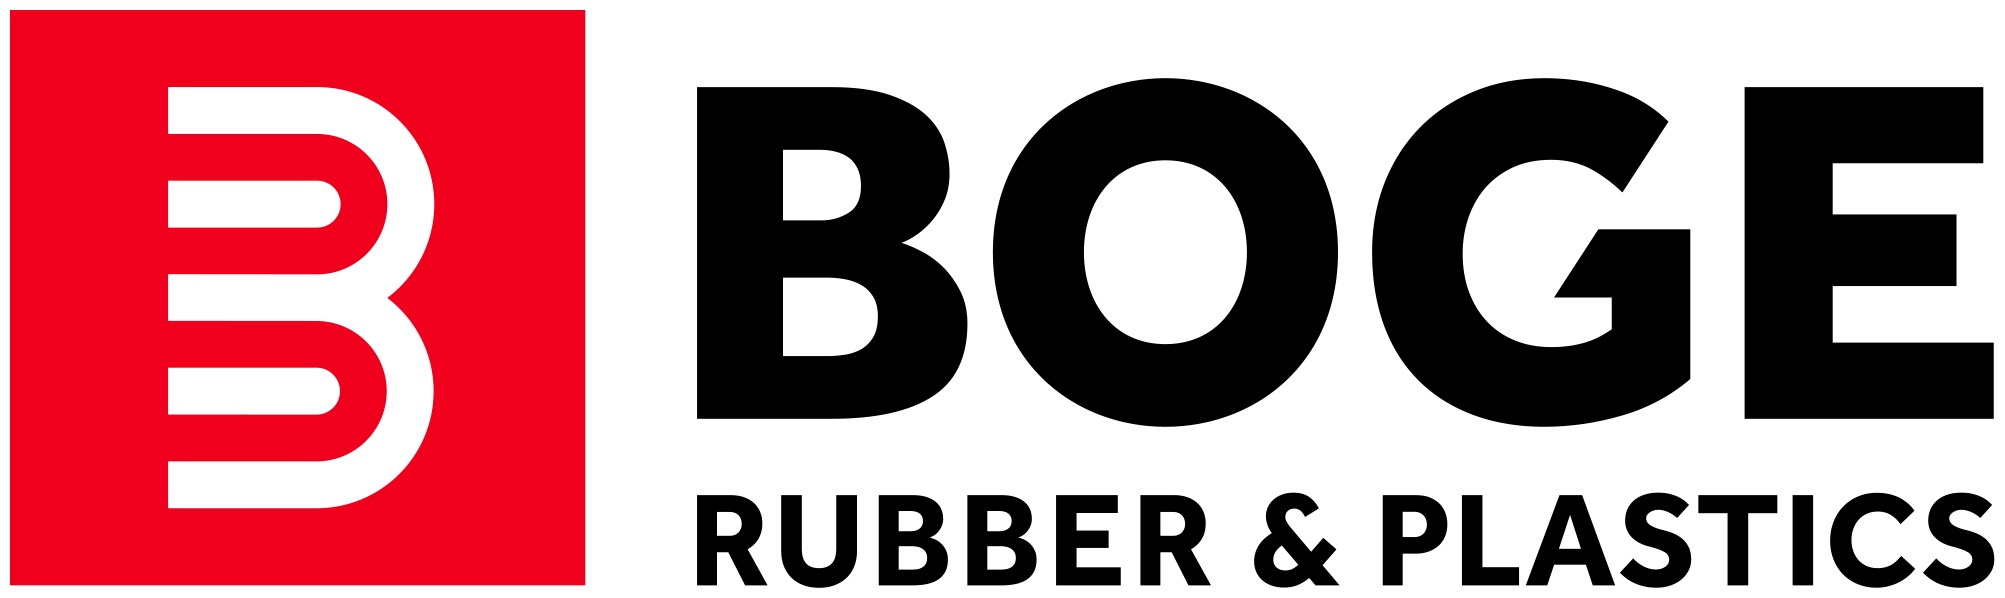 Boge_Logo.jpg